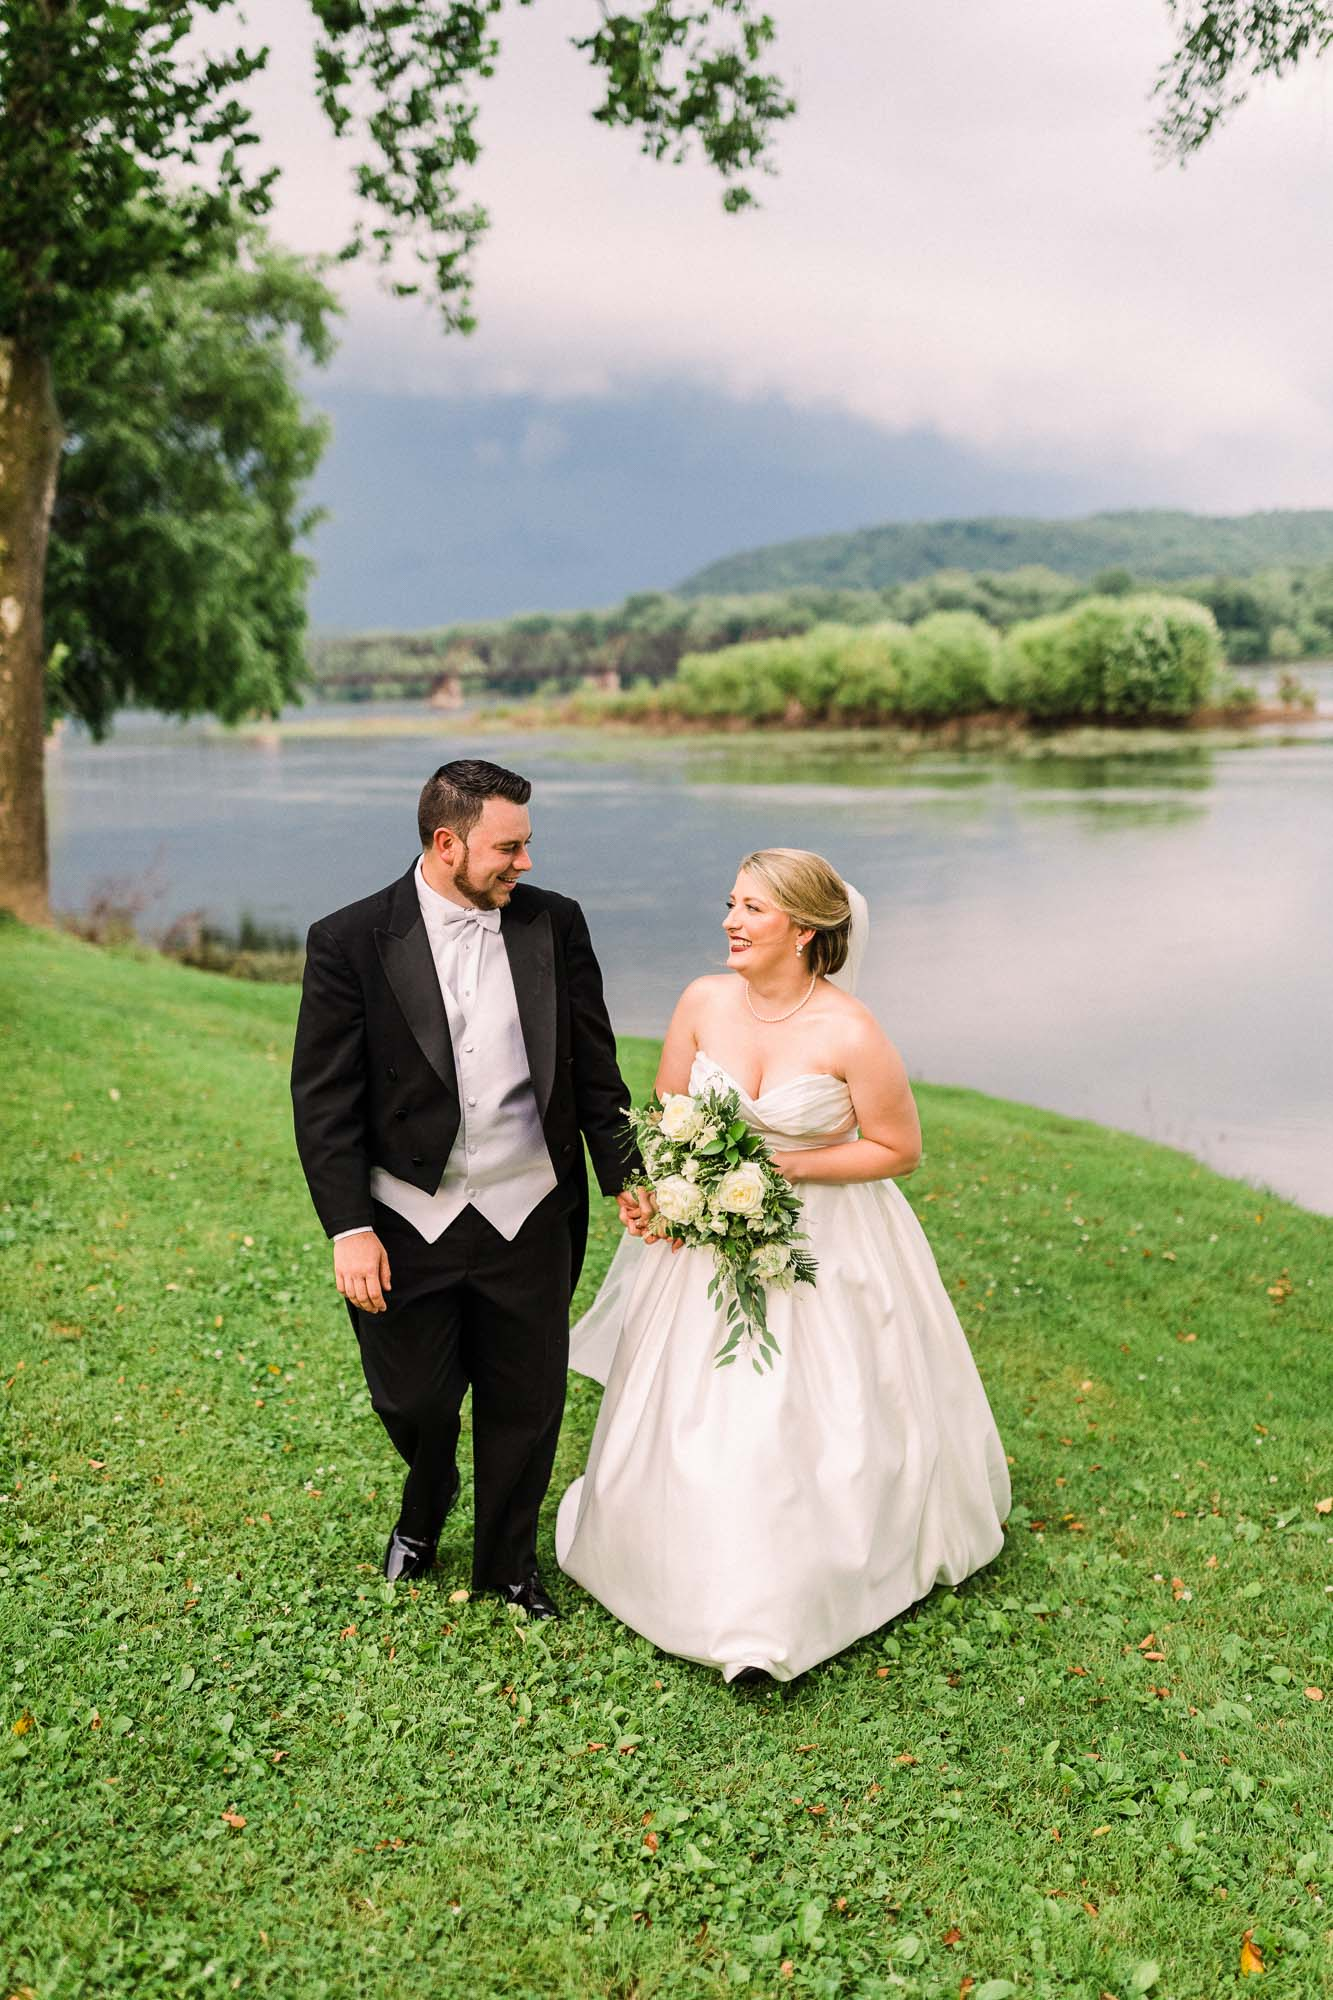 isle-of-que-wedding-6951.jpg